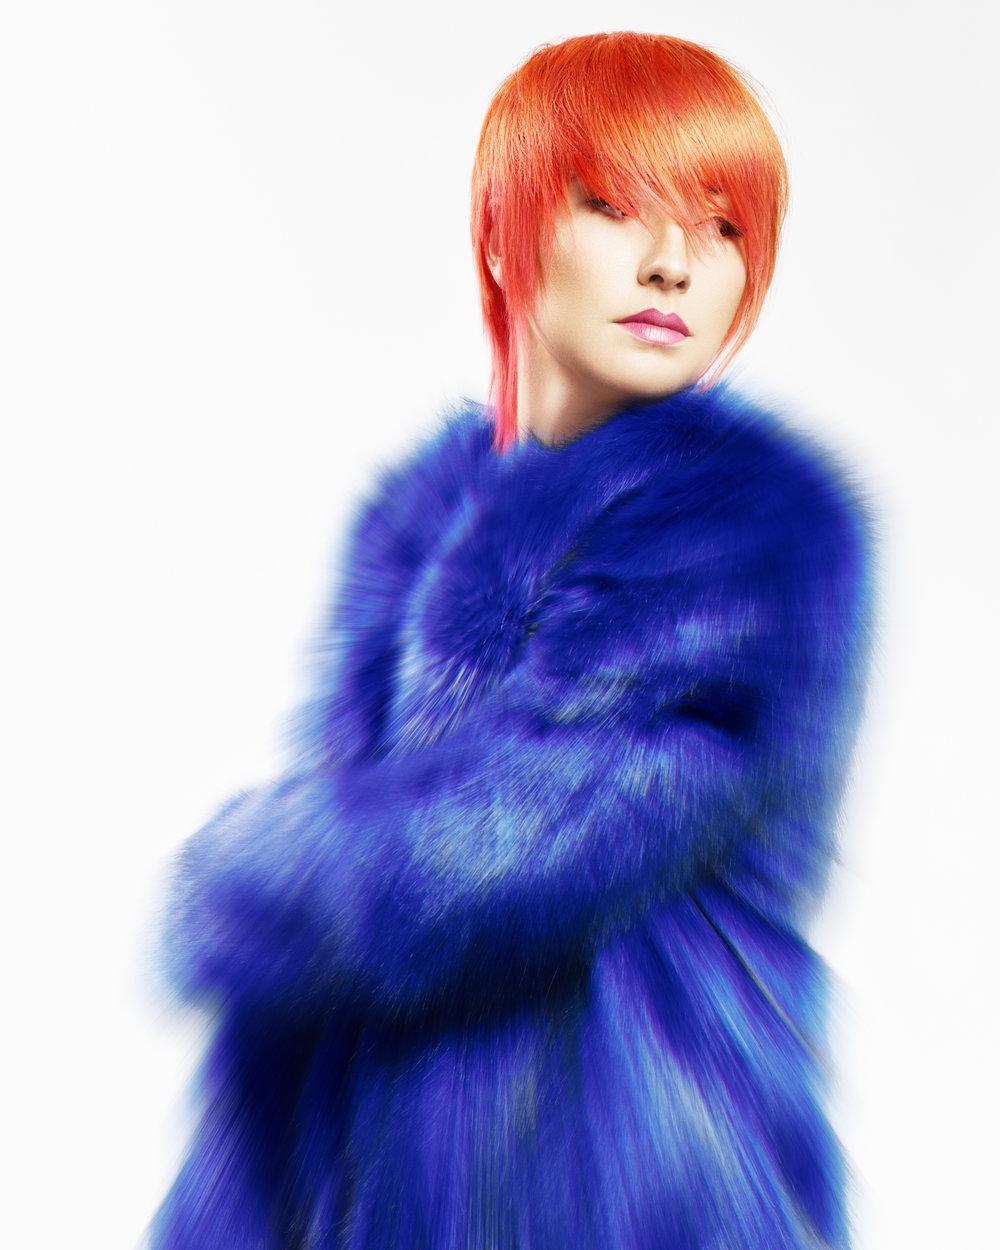 Vicki Orange_1672.jpg